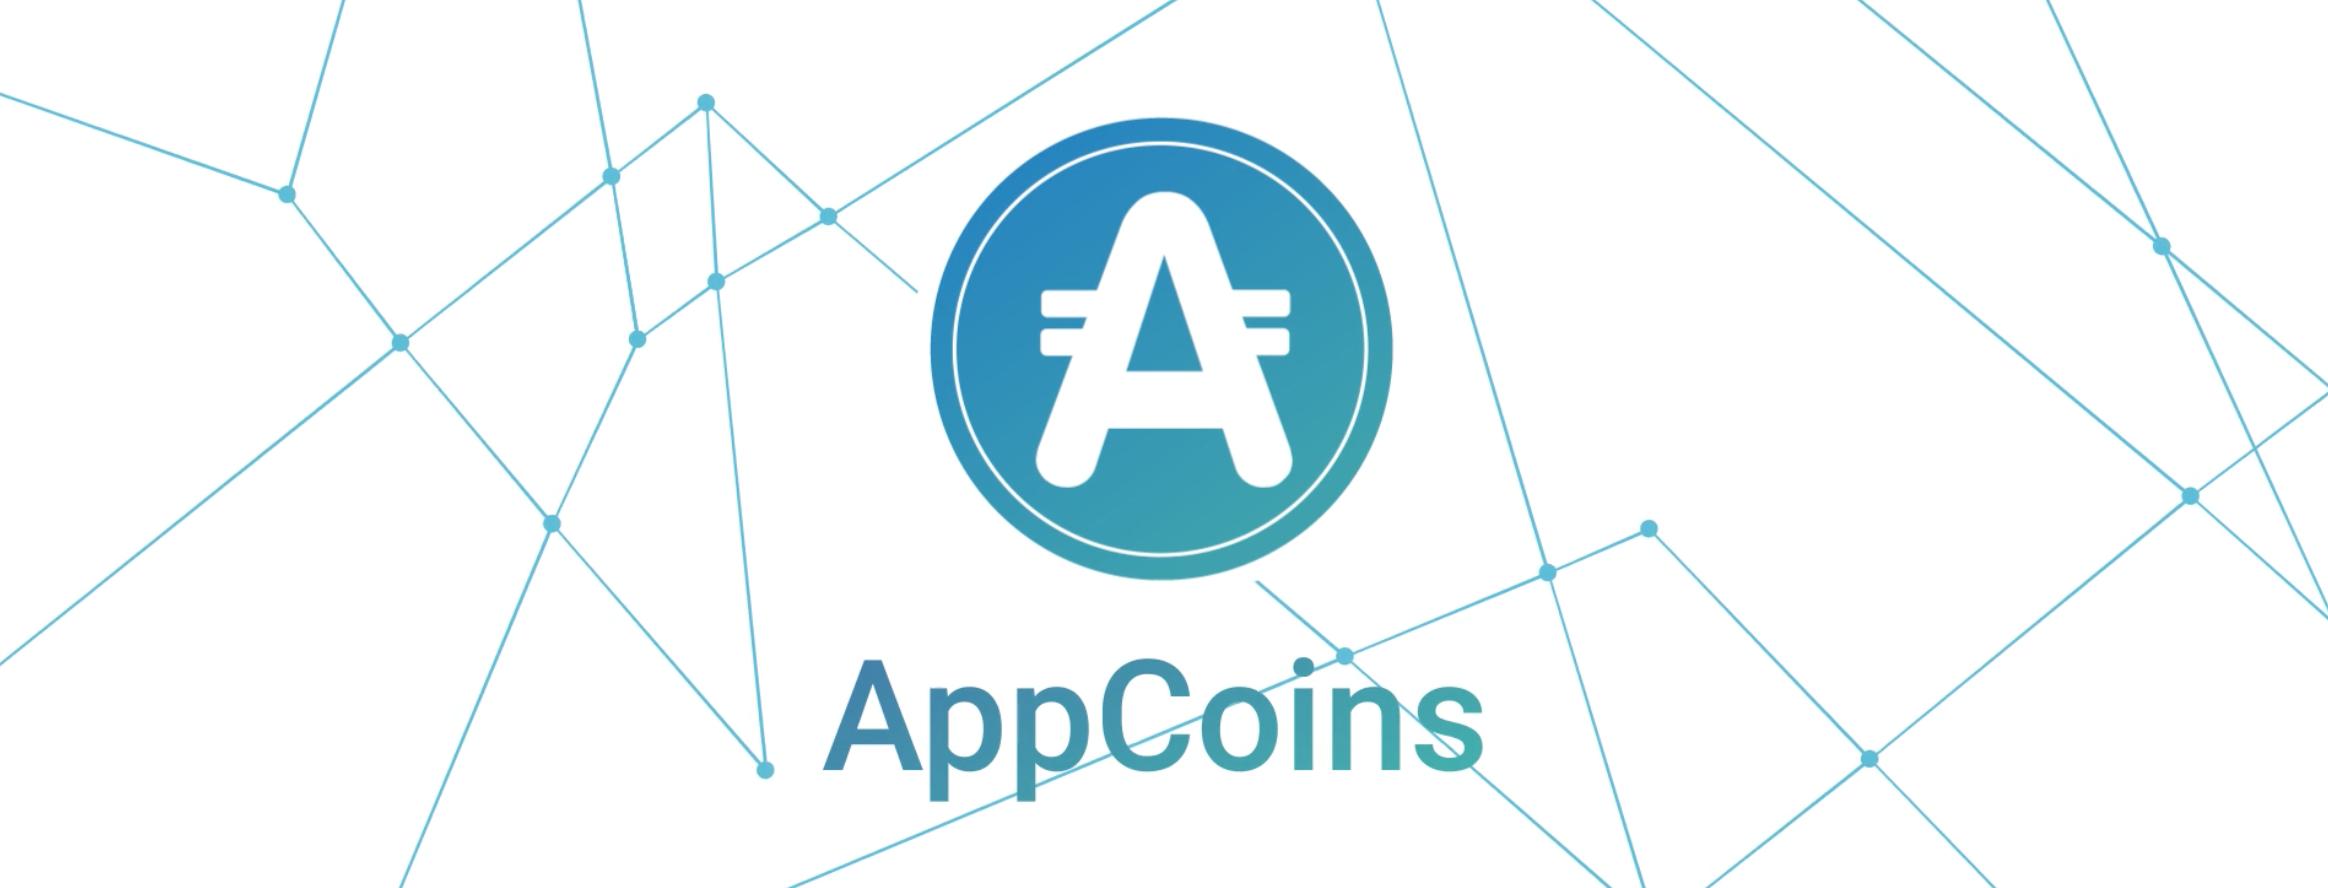 AppCoins Token Sale is Live, Promises a New App Economy